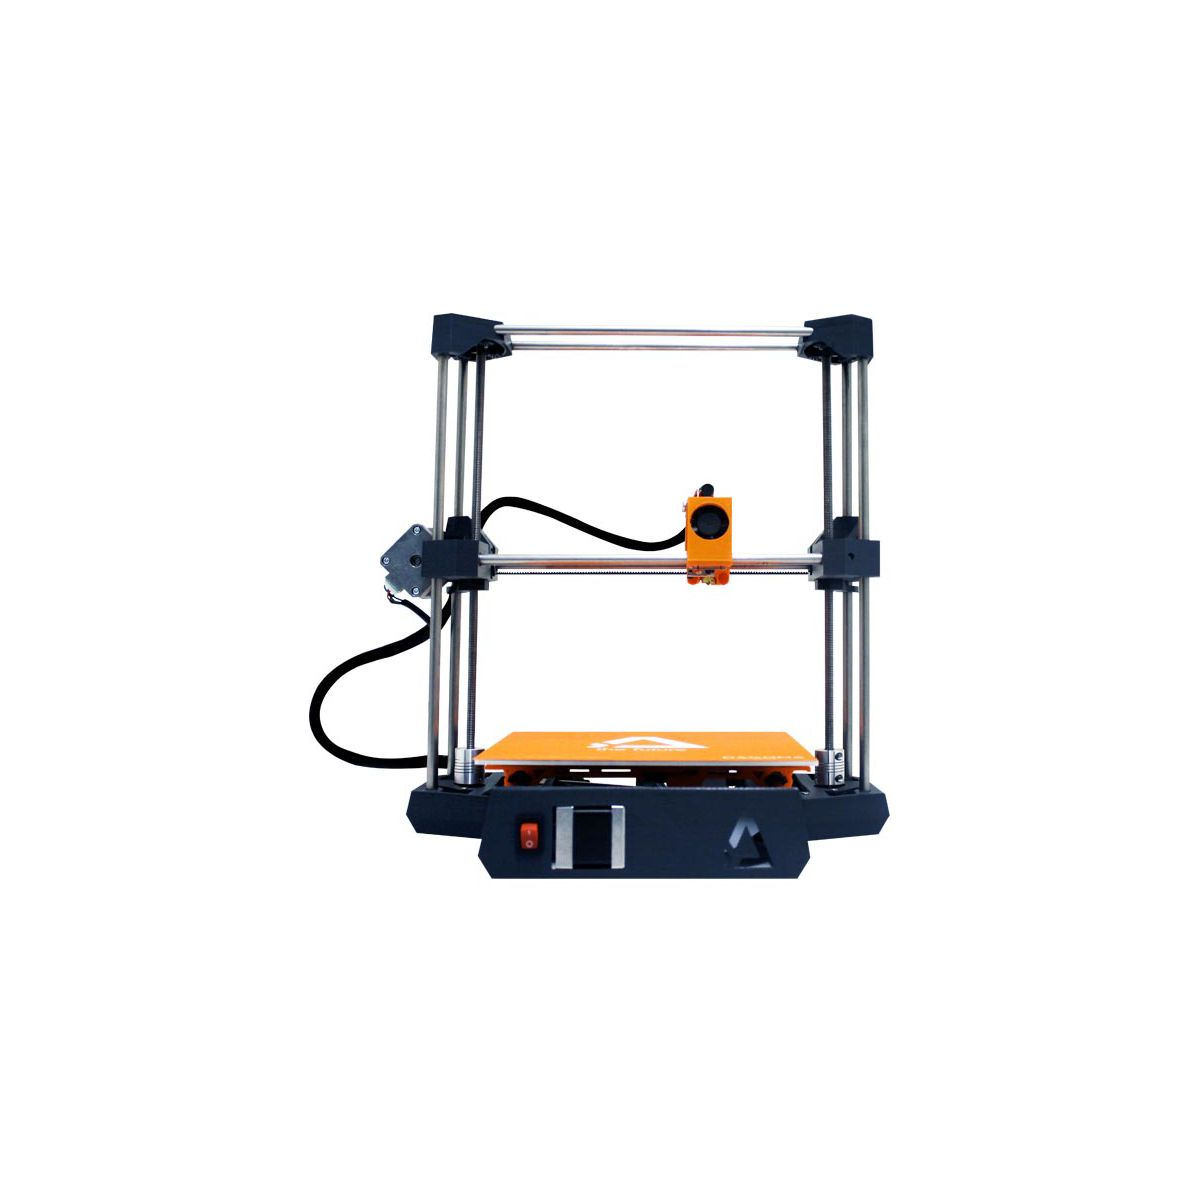 Imprimante 3D DAGOMA Discovery 200 montée (photo)